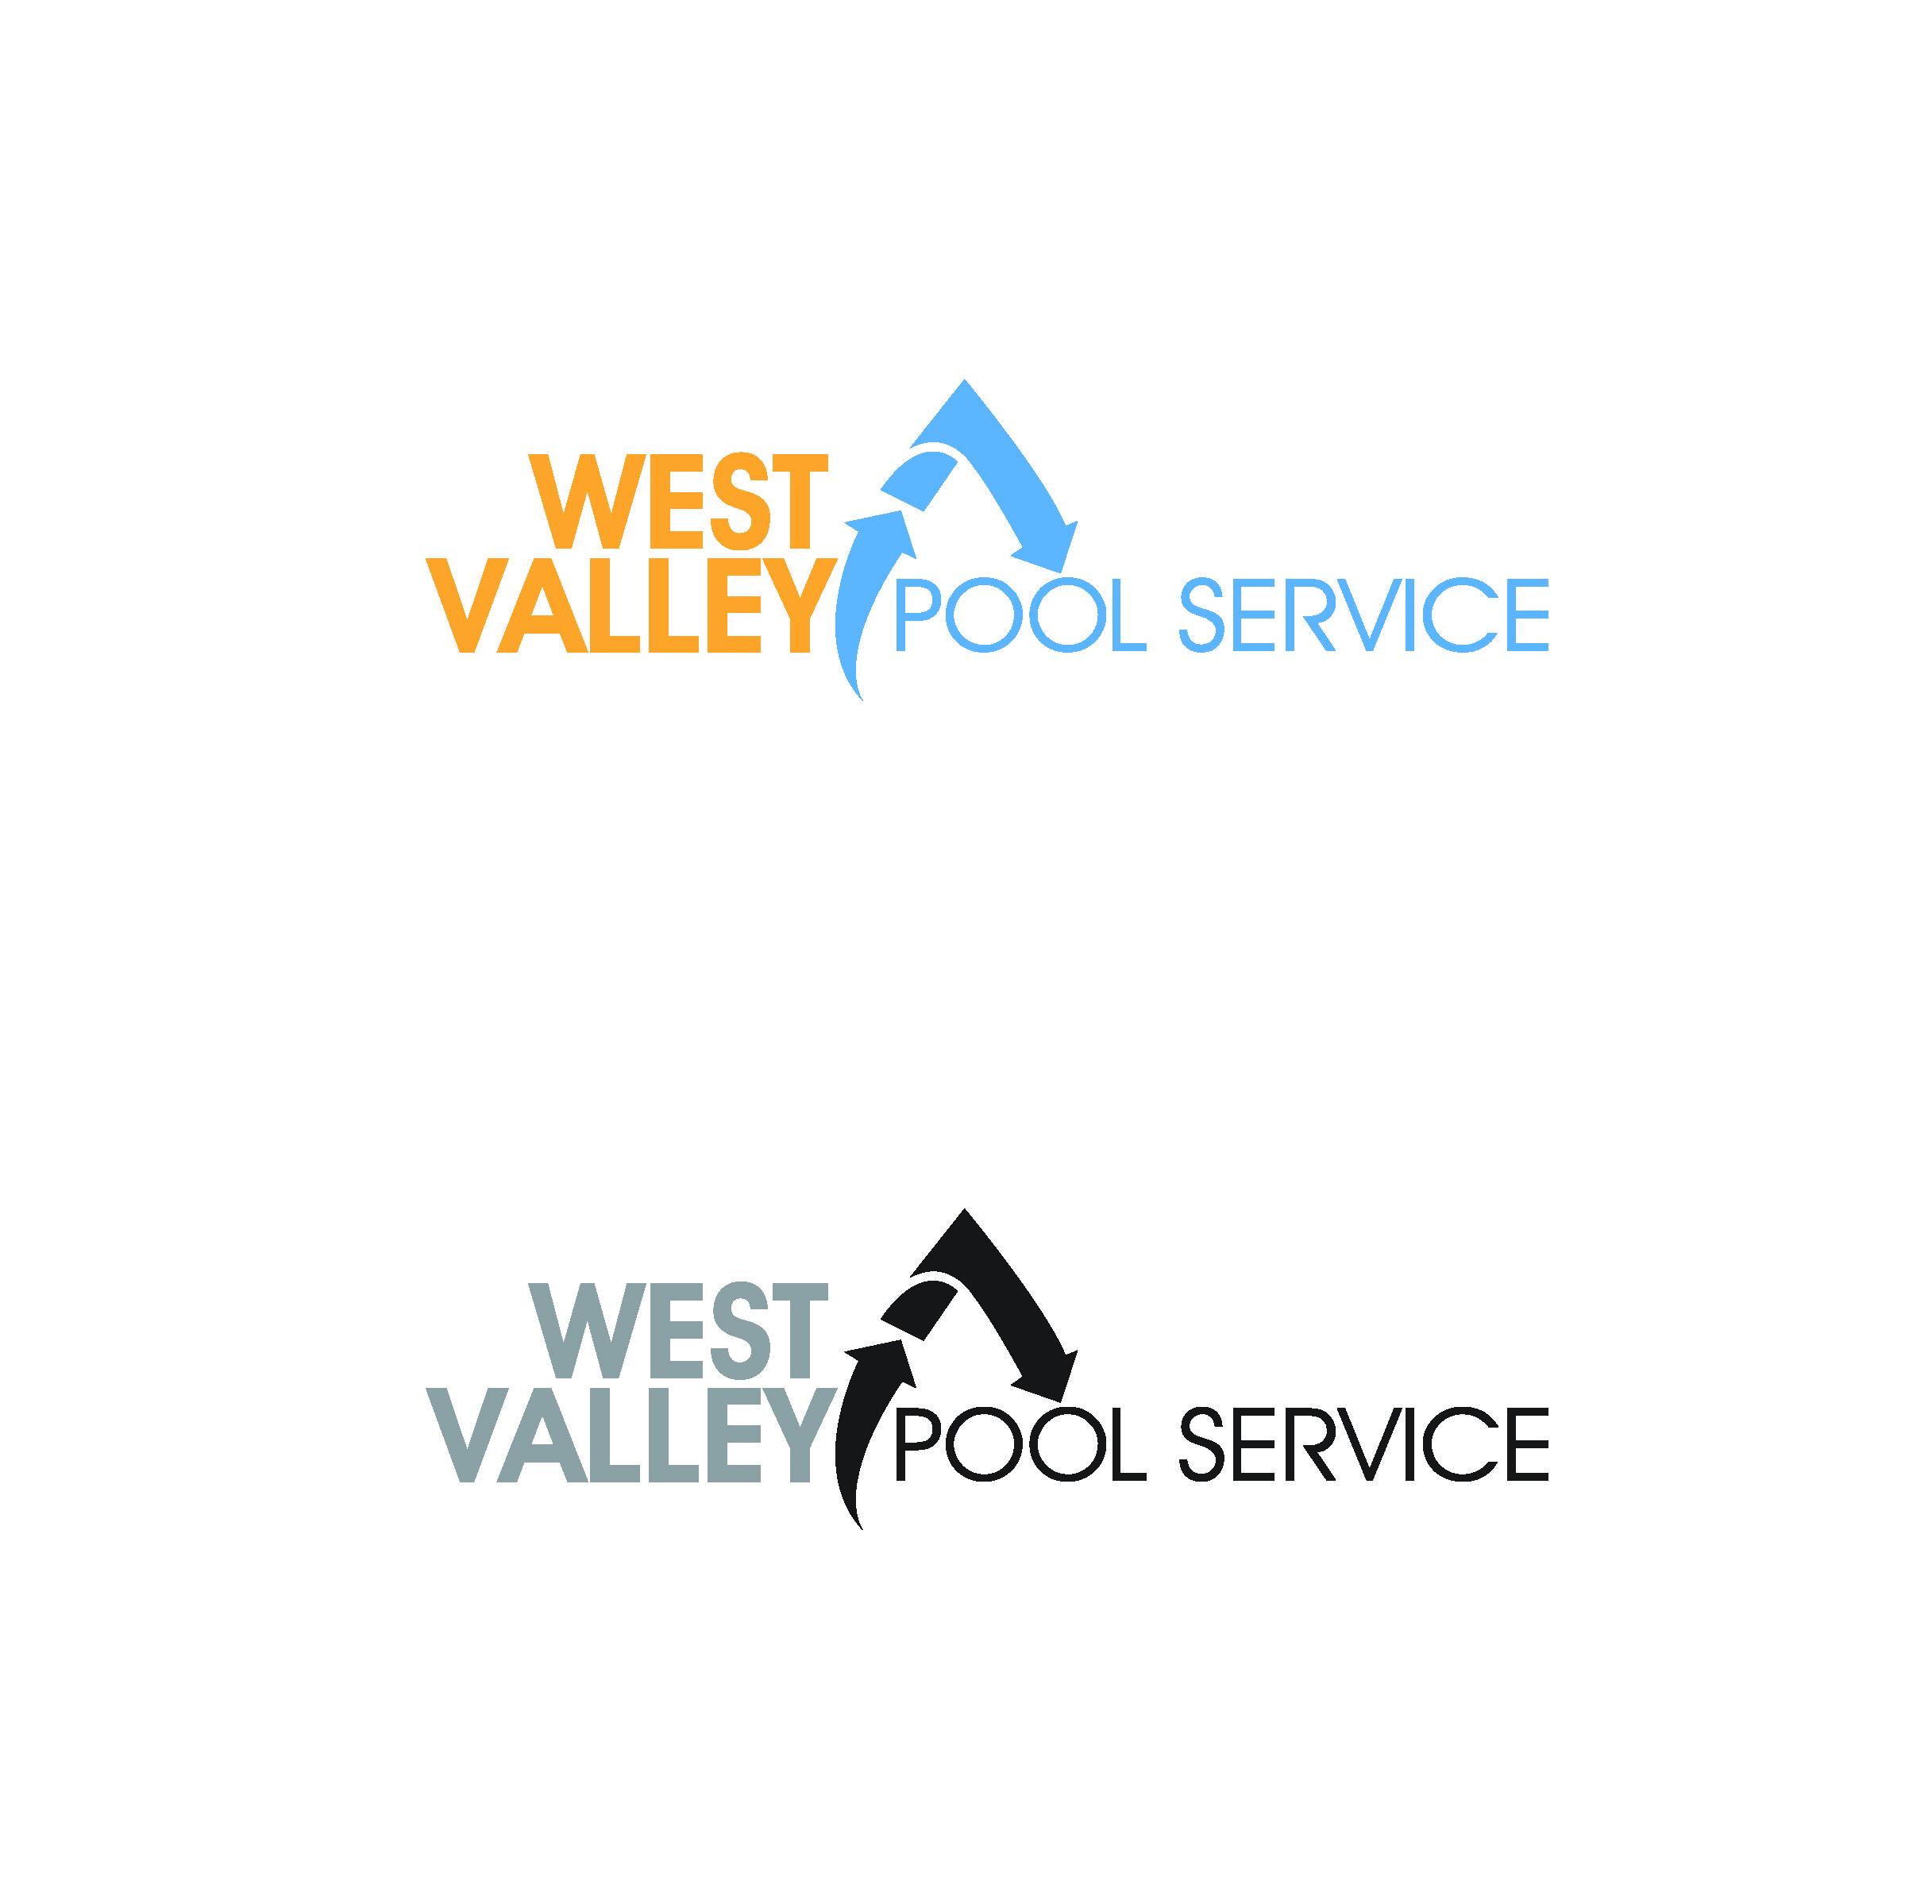 Logo Design by Sampath Gunathilaka - Entry No. 101 in the Logo Design Contest Clever Logo Design for West Valley Pool Service.